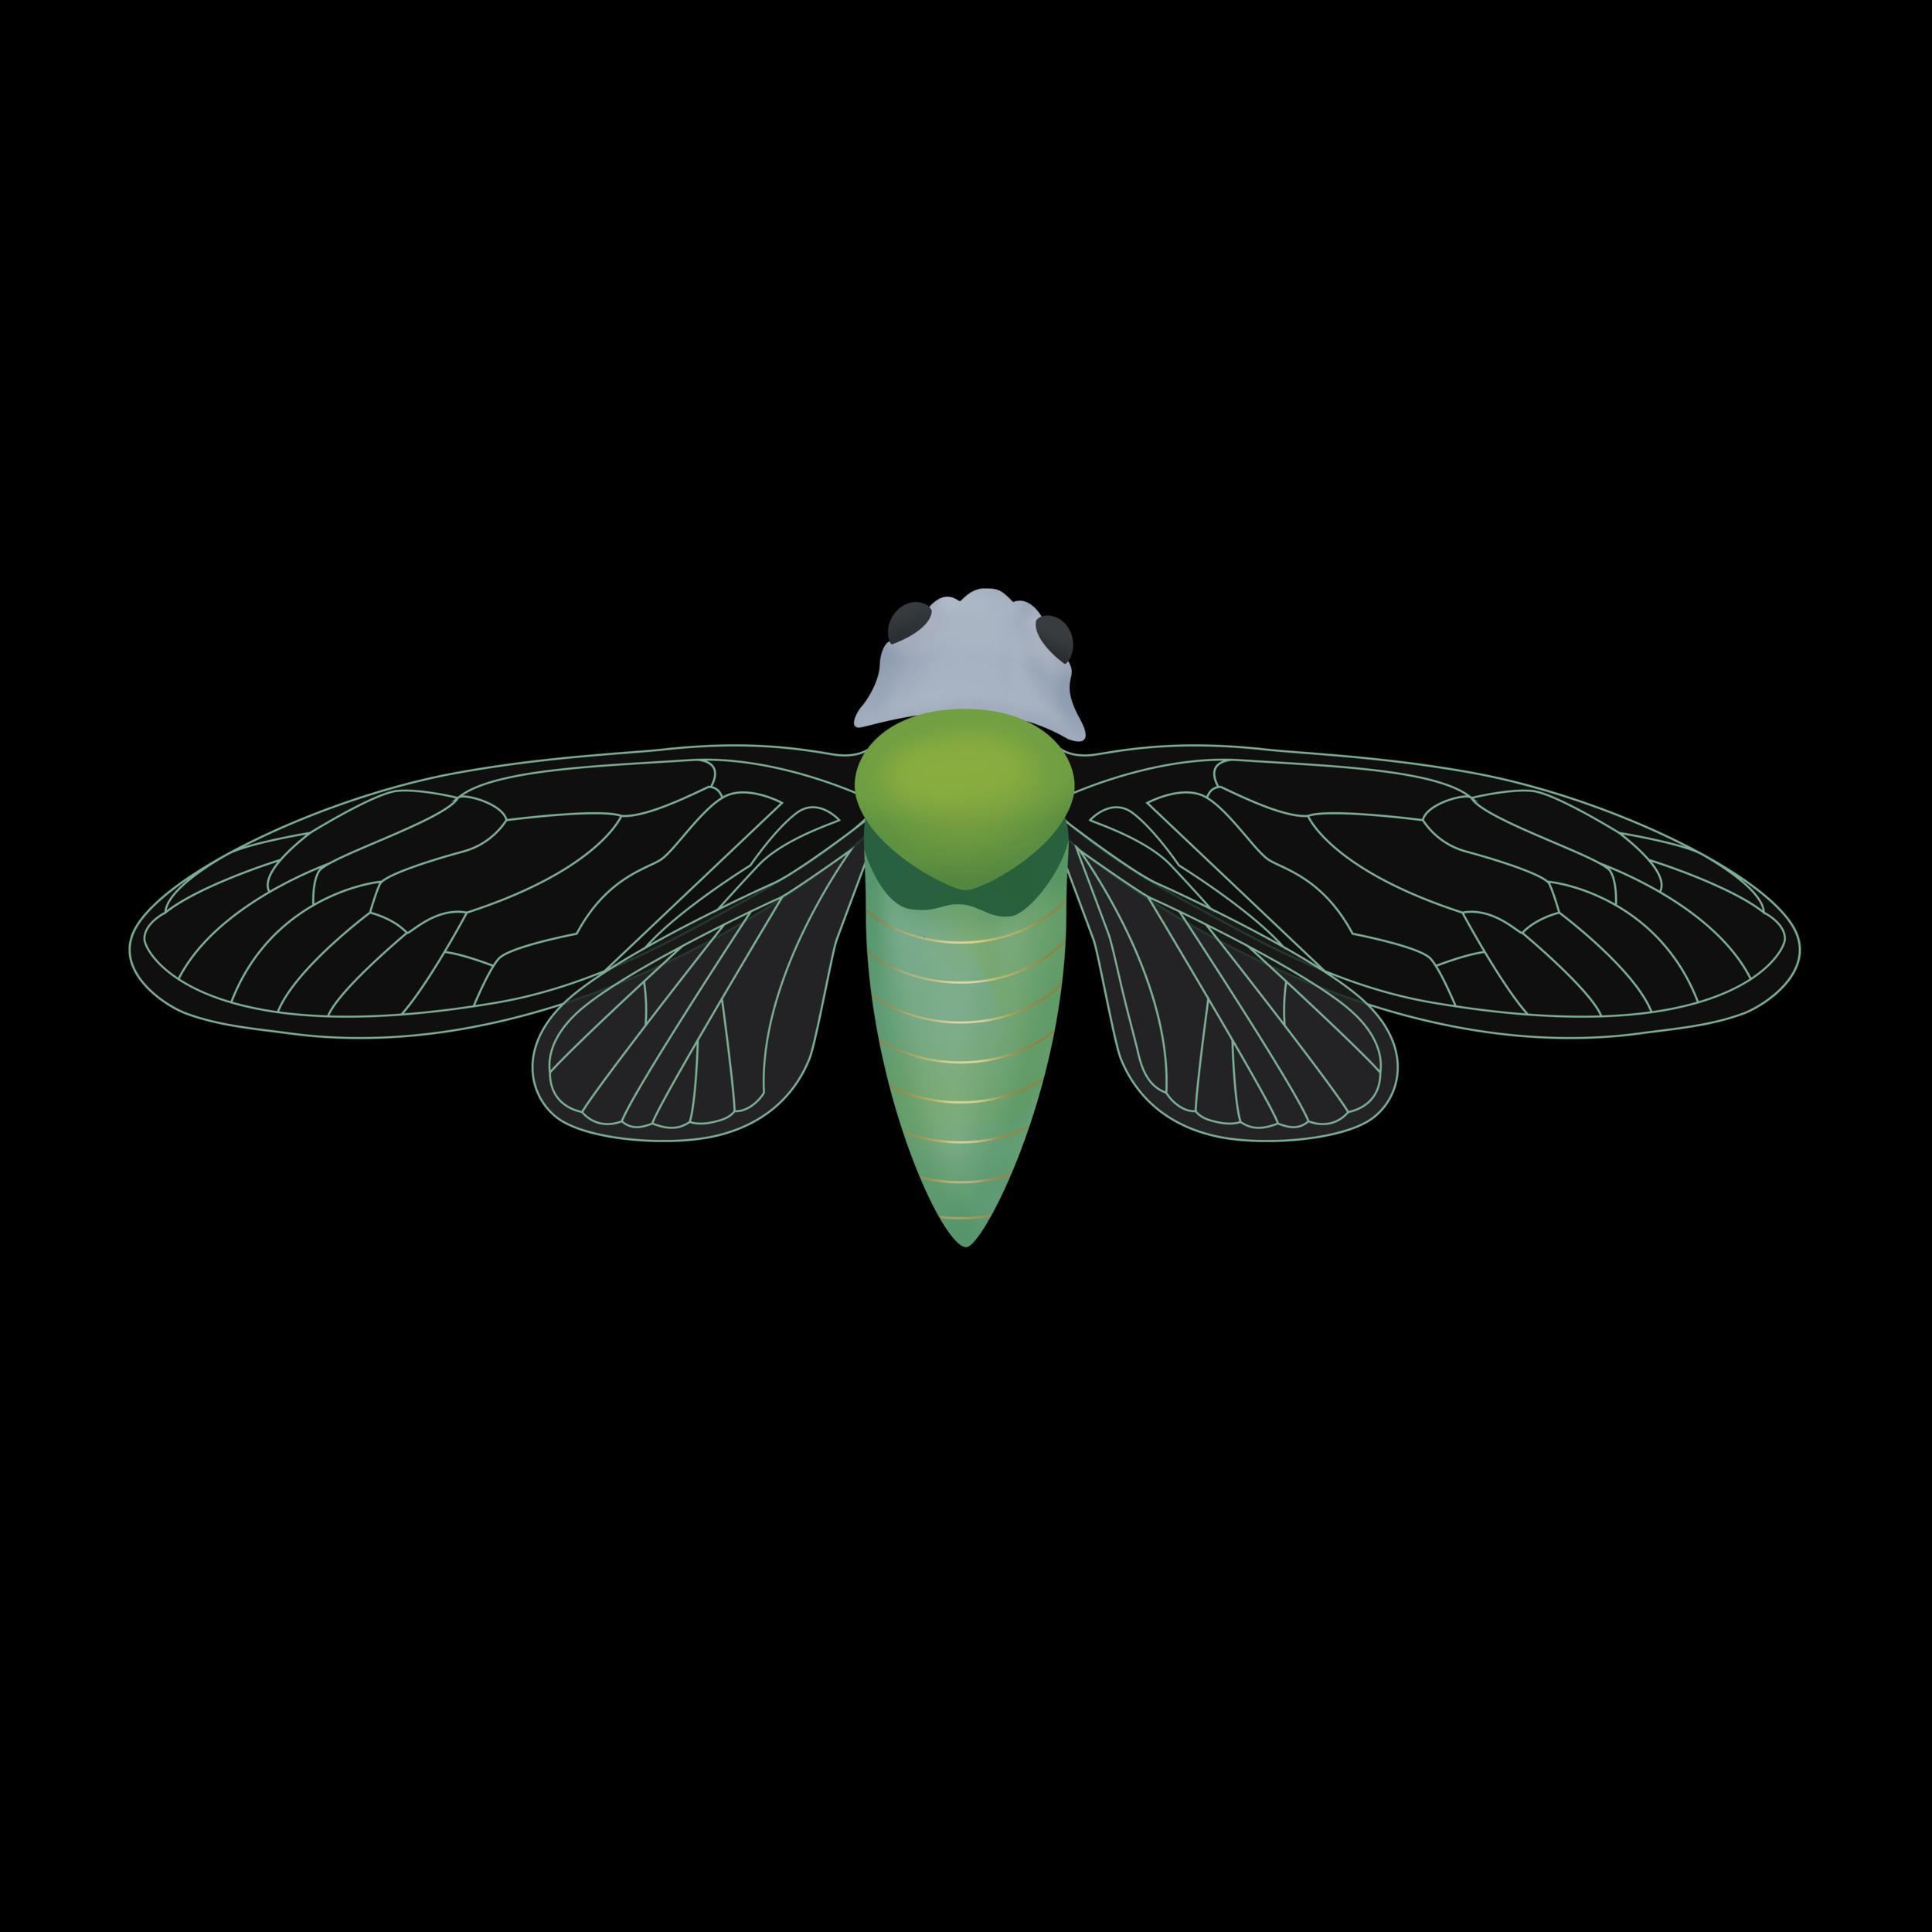 Cicada_v1+2.png